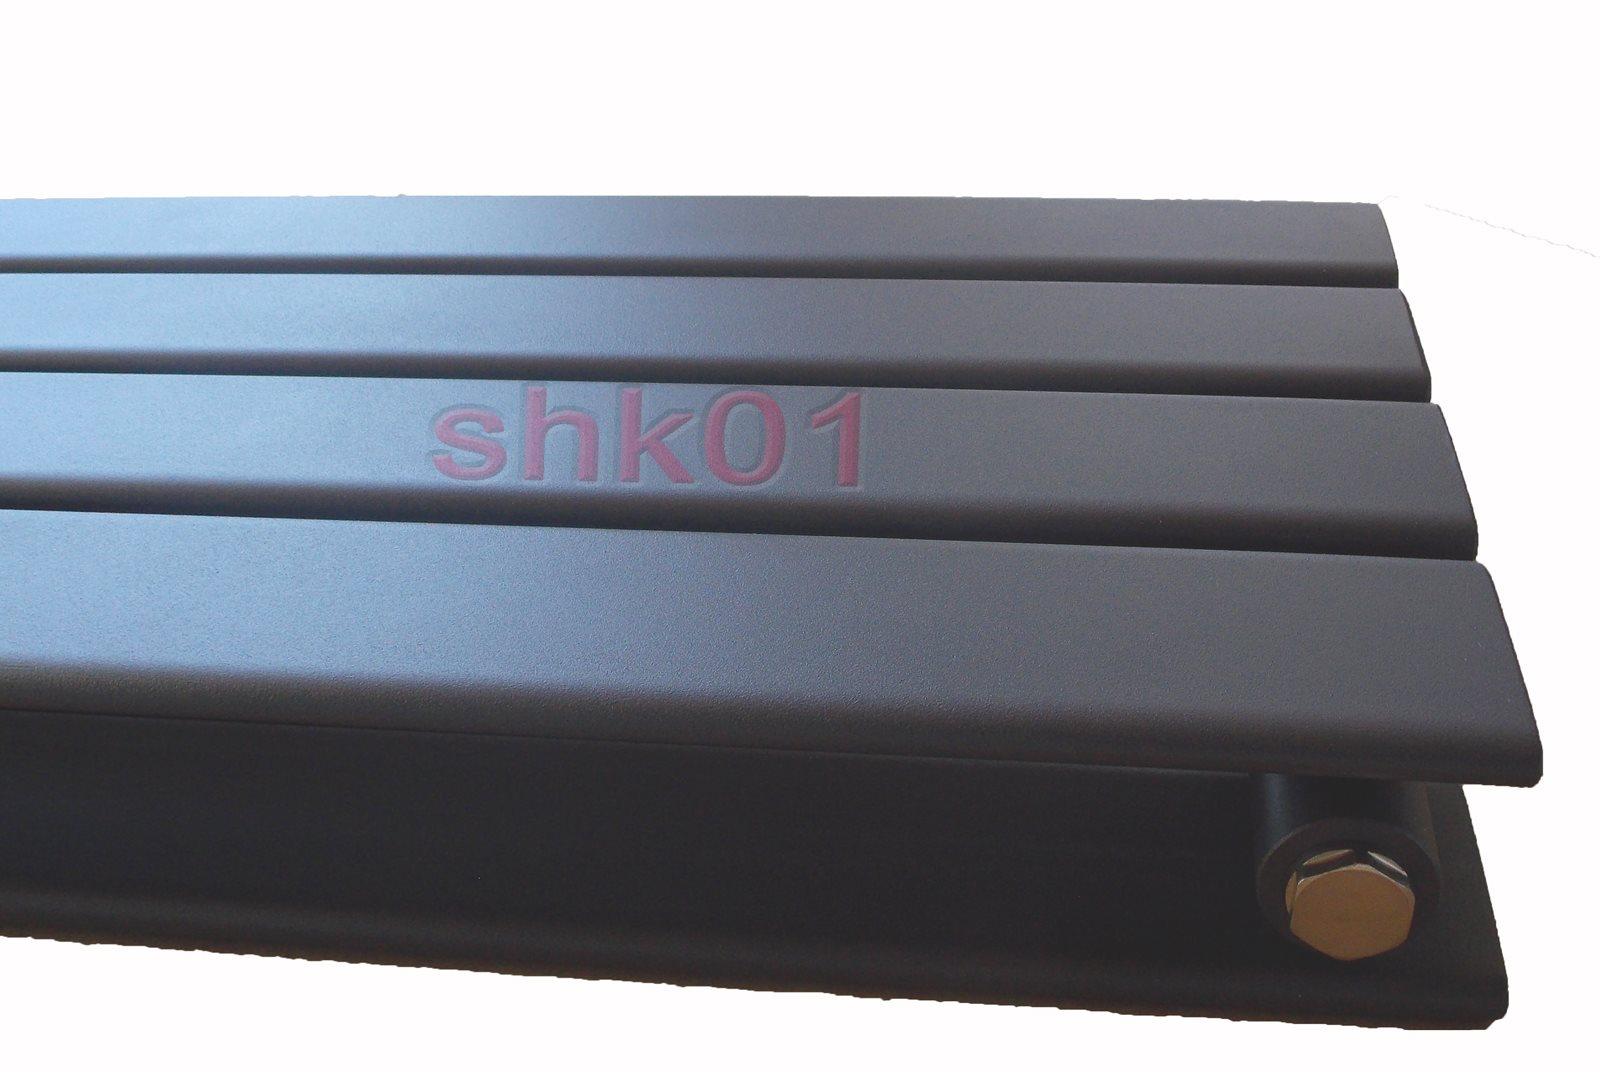 Design panel radiator double layered panel radiator designer panel radiator ebay - Extern panel ...